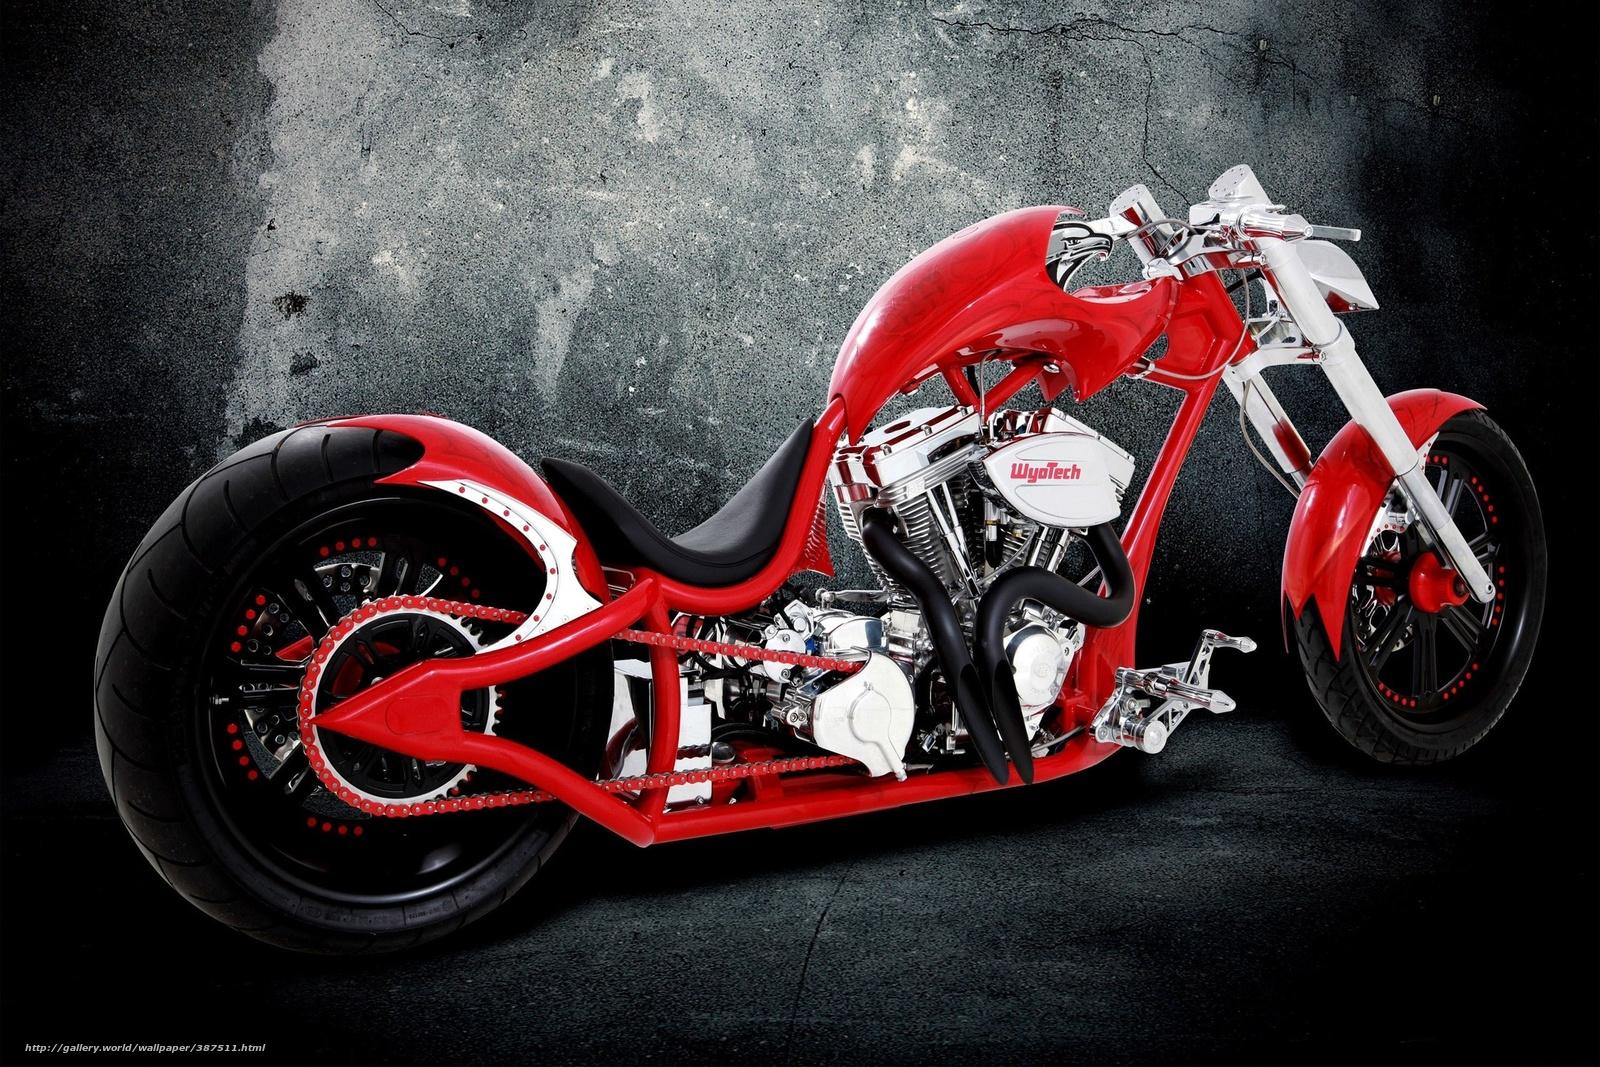 Download Wallpaper Red Bike Moto Cars Free Desktop